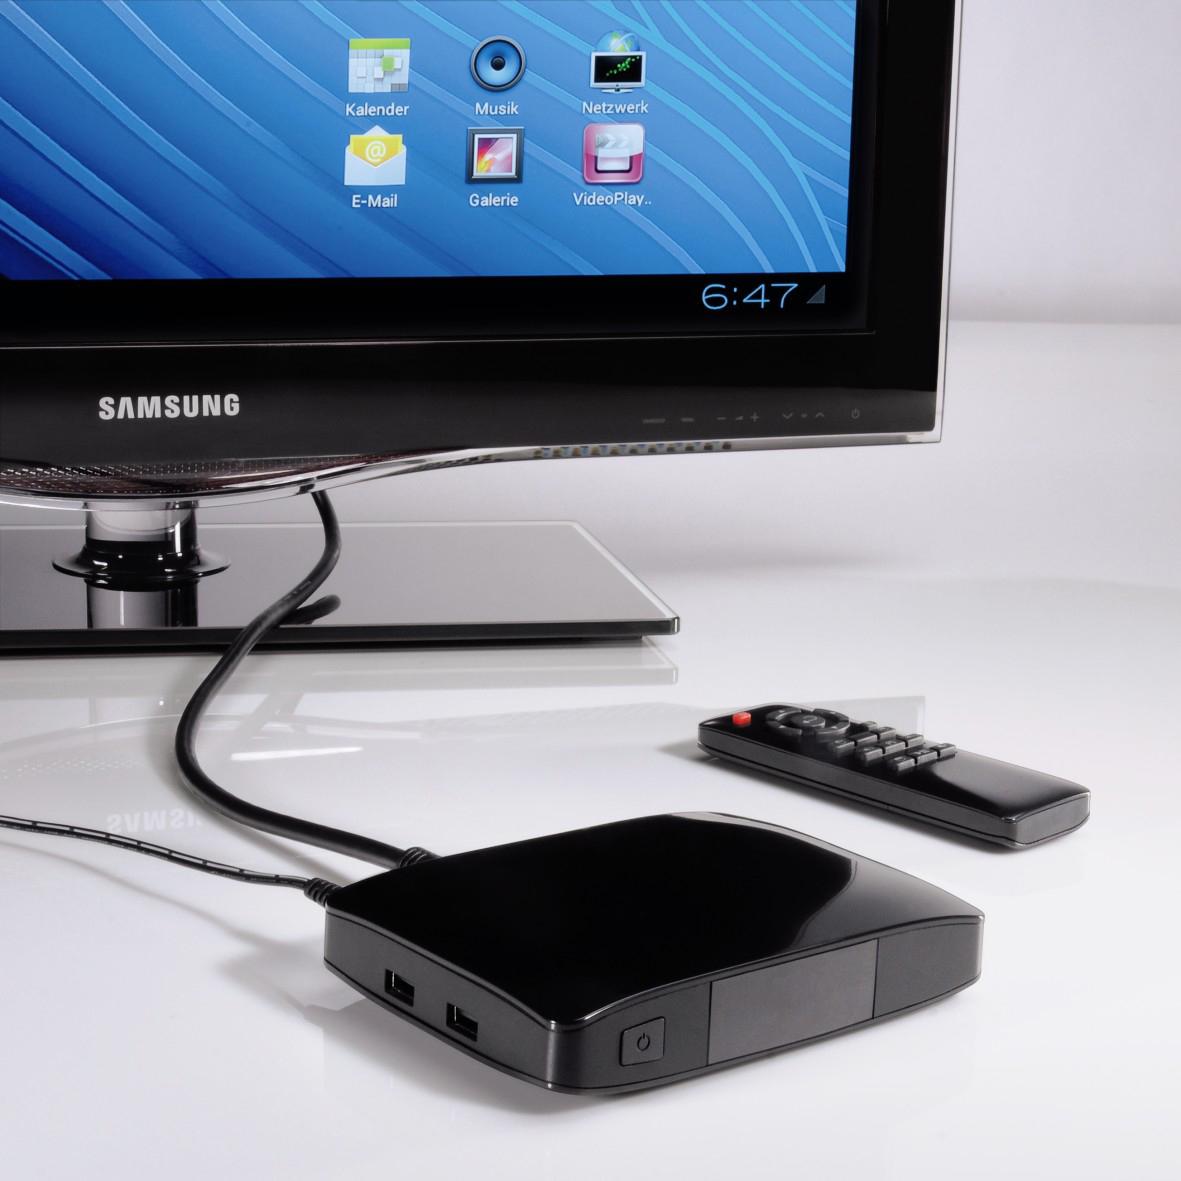 Kak-podkljuchit-monitor-k-cifrovoj-TV-pristavke-1.jpg